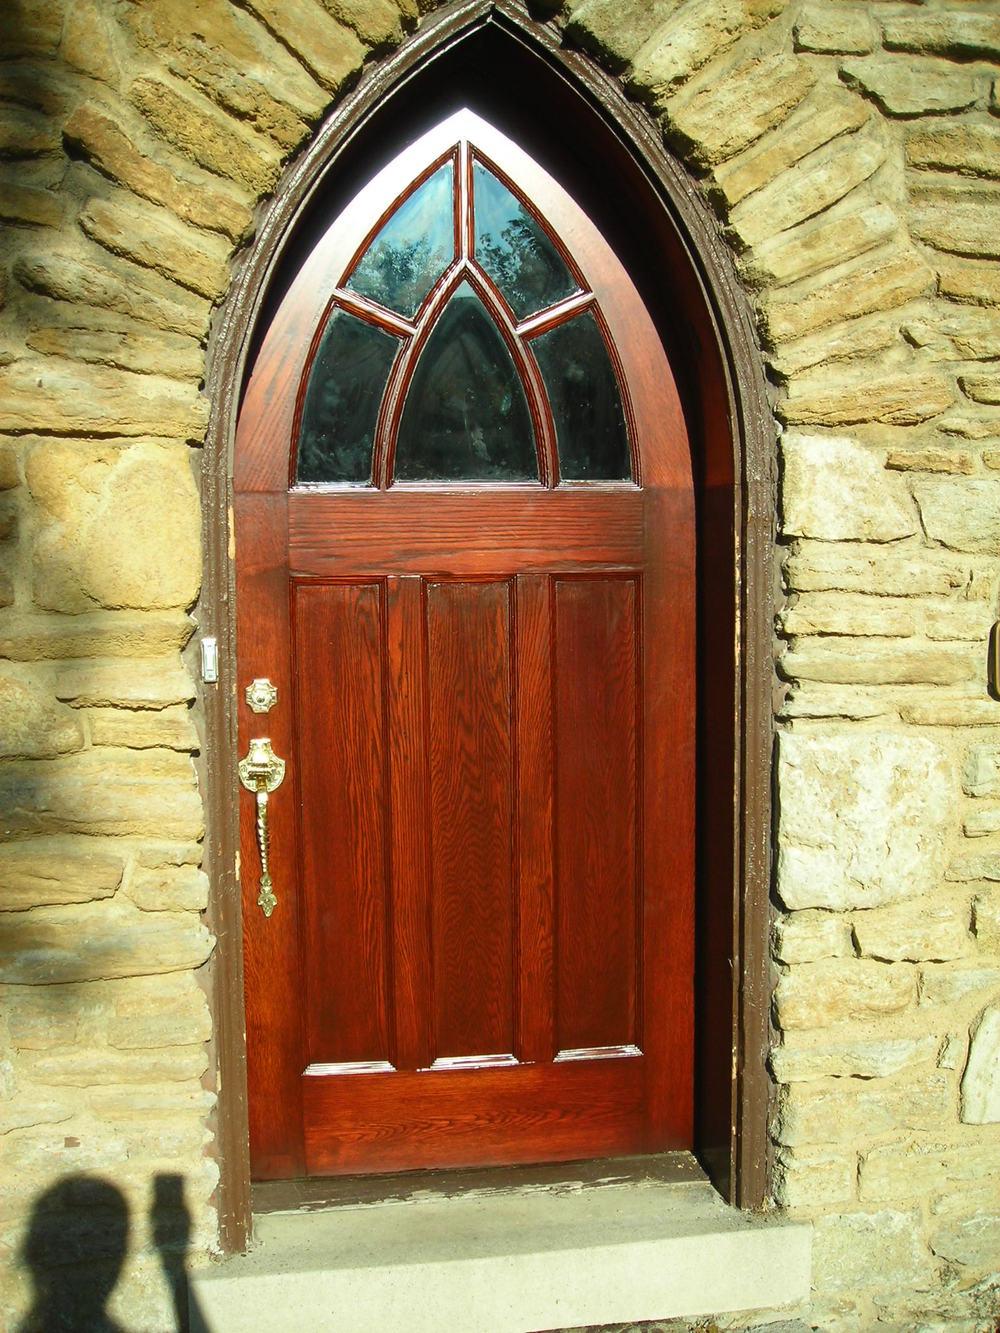 Copy of exterior-door-wood-wooden-refinish-refinishing-weathered